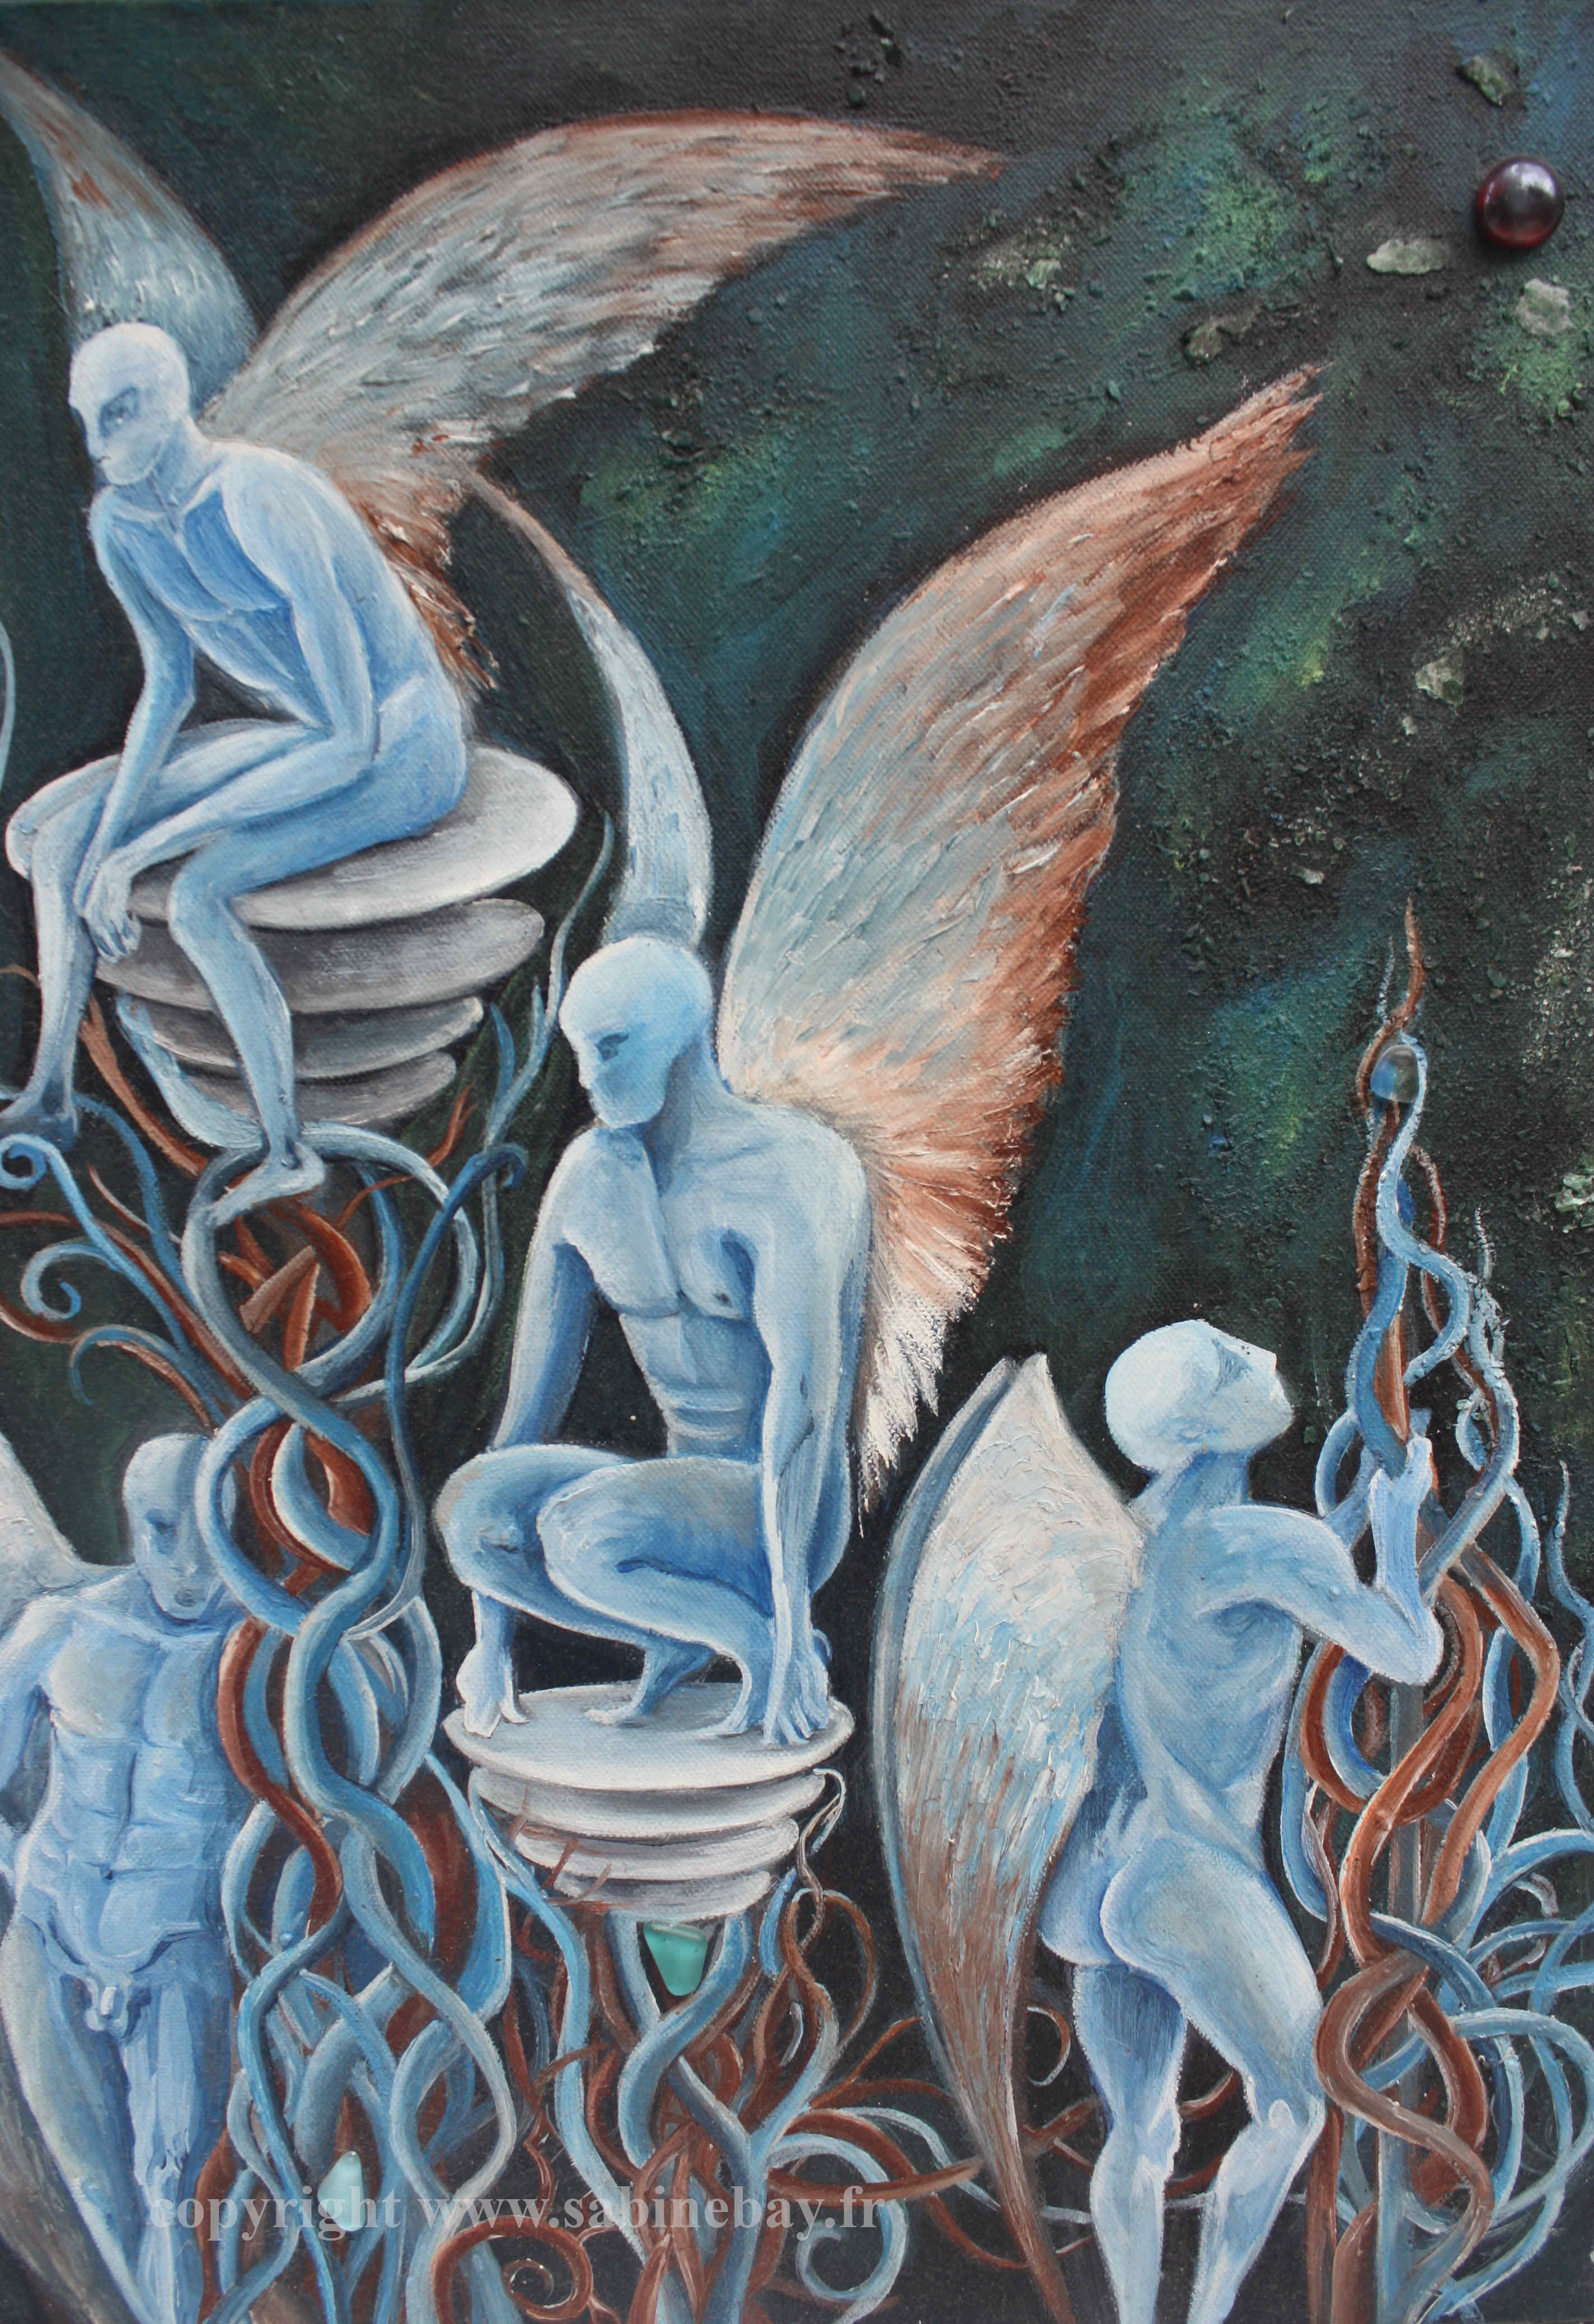 L'ennui des anges